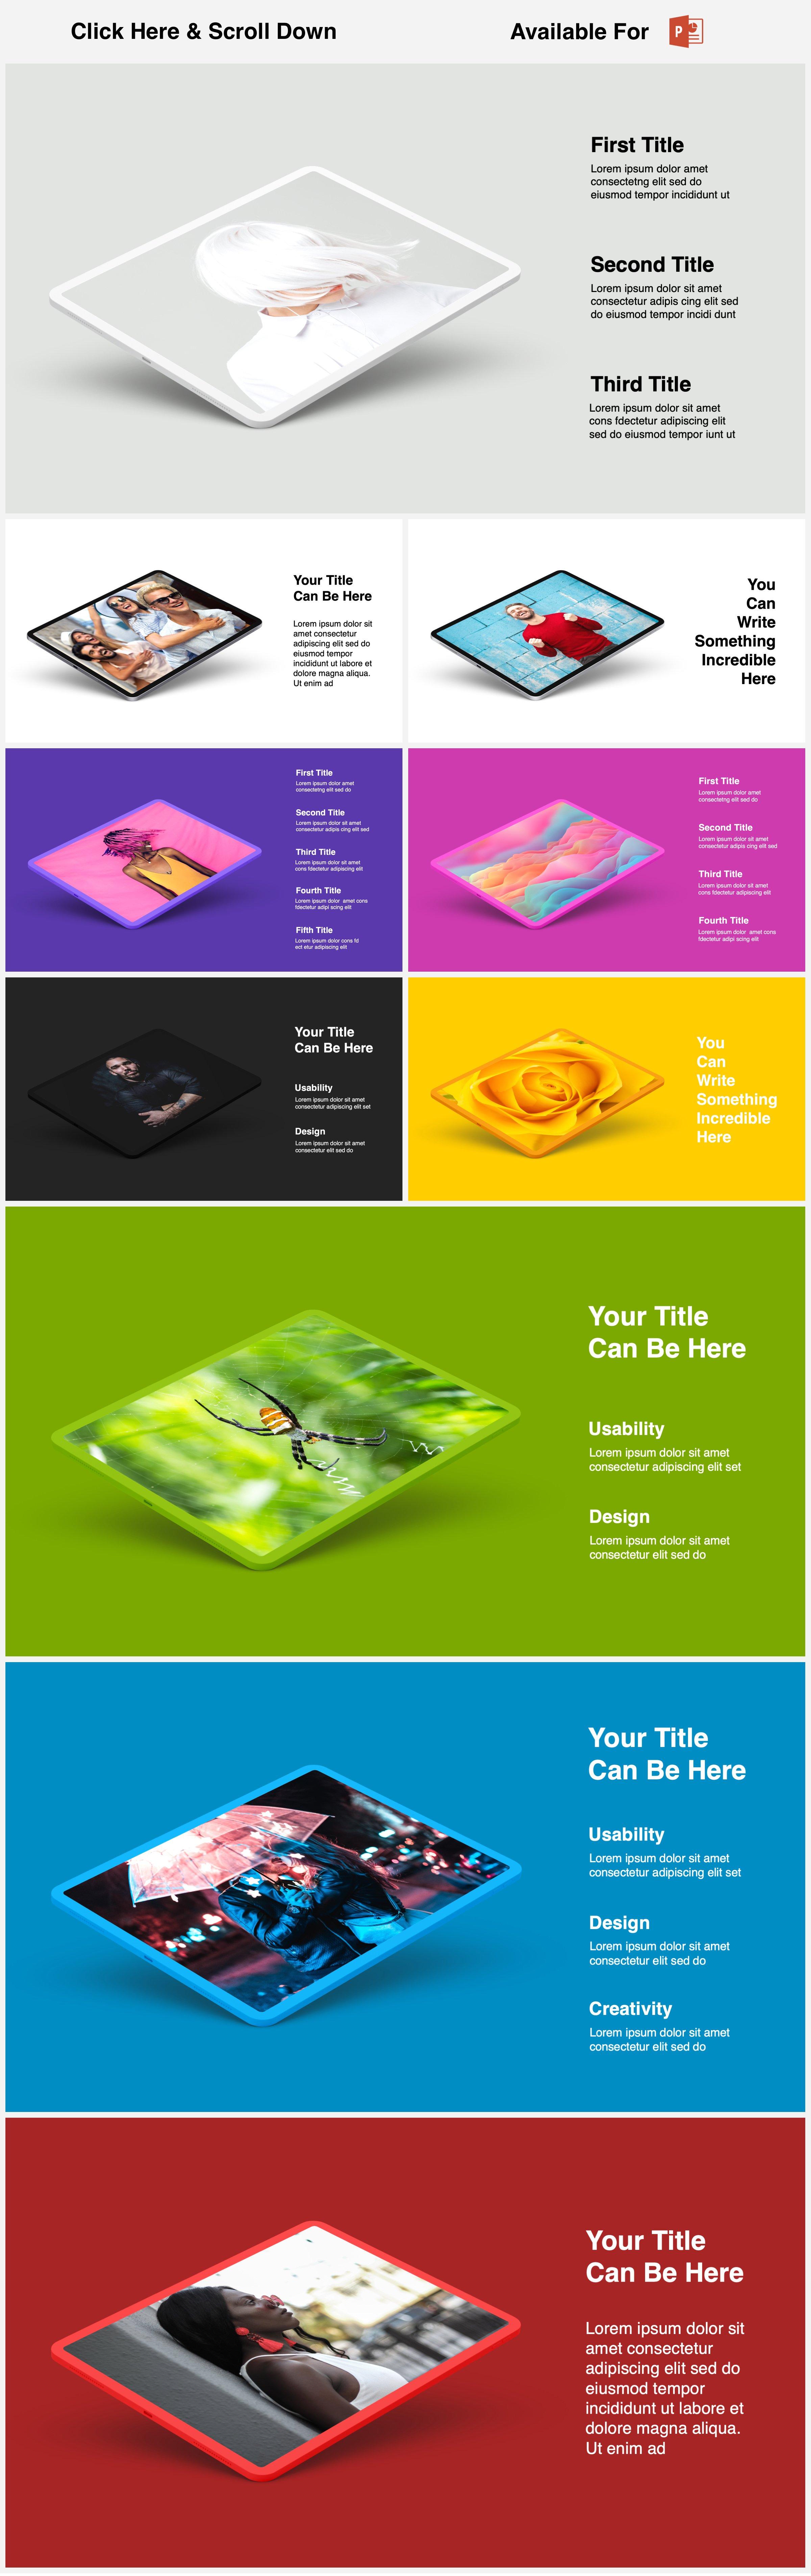 Animated Mockups Presentation Bundle. Infographic Templates. example image 23